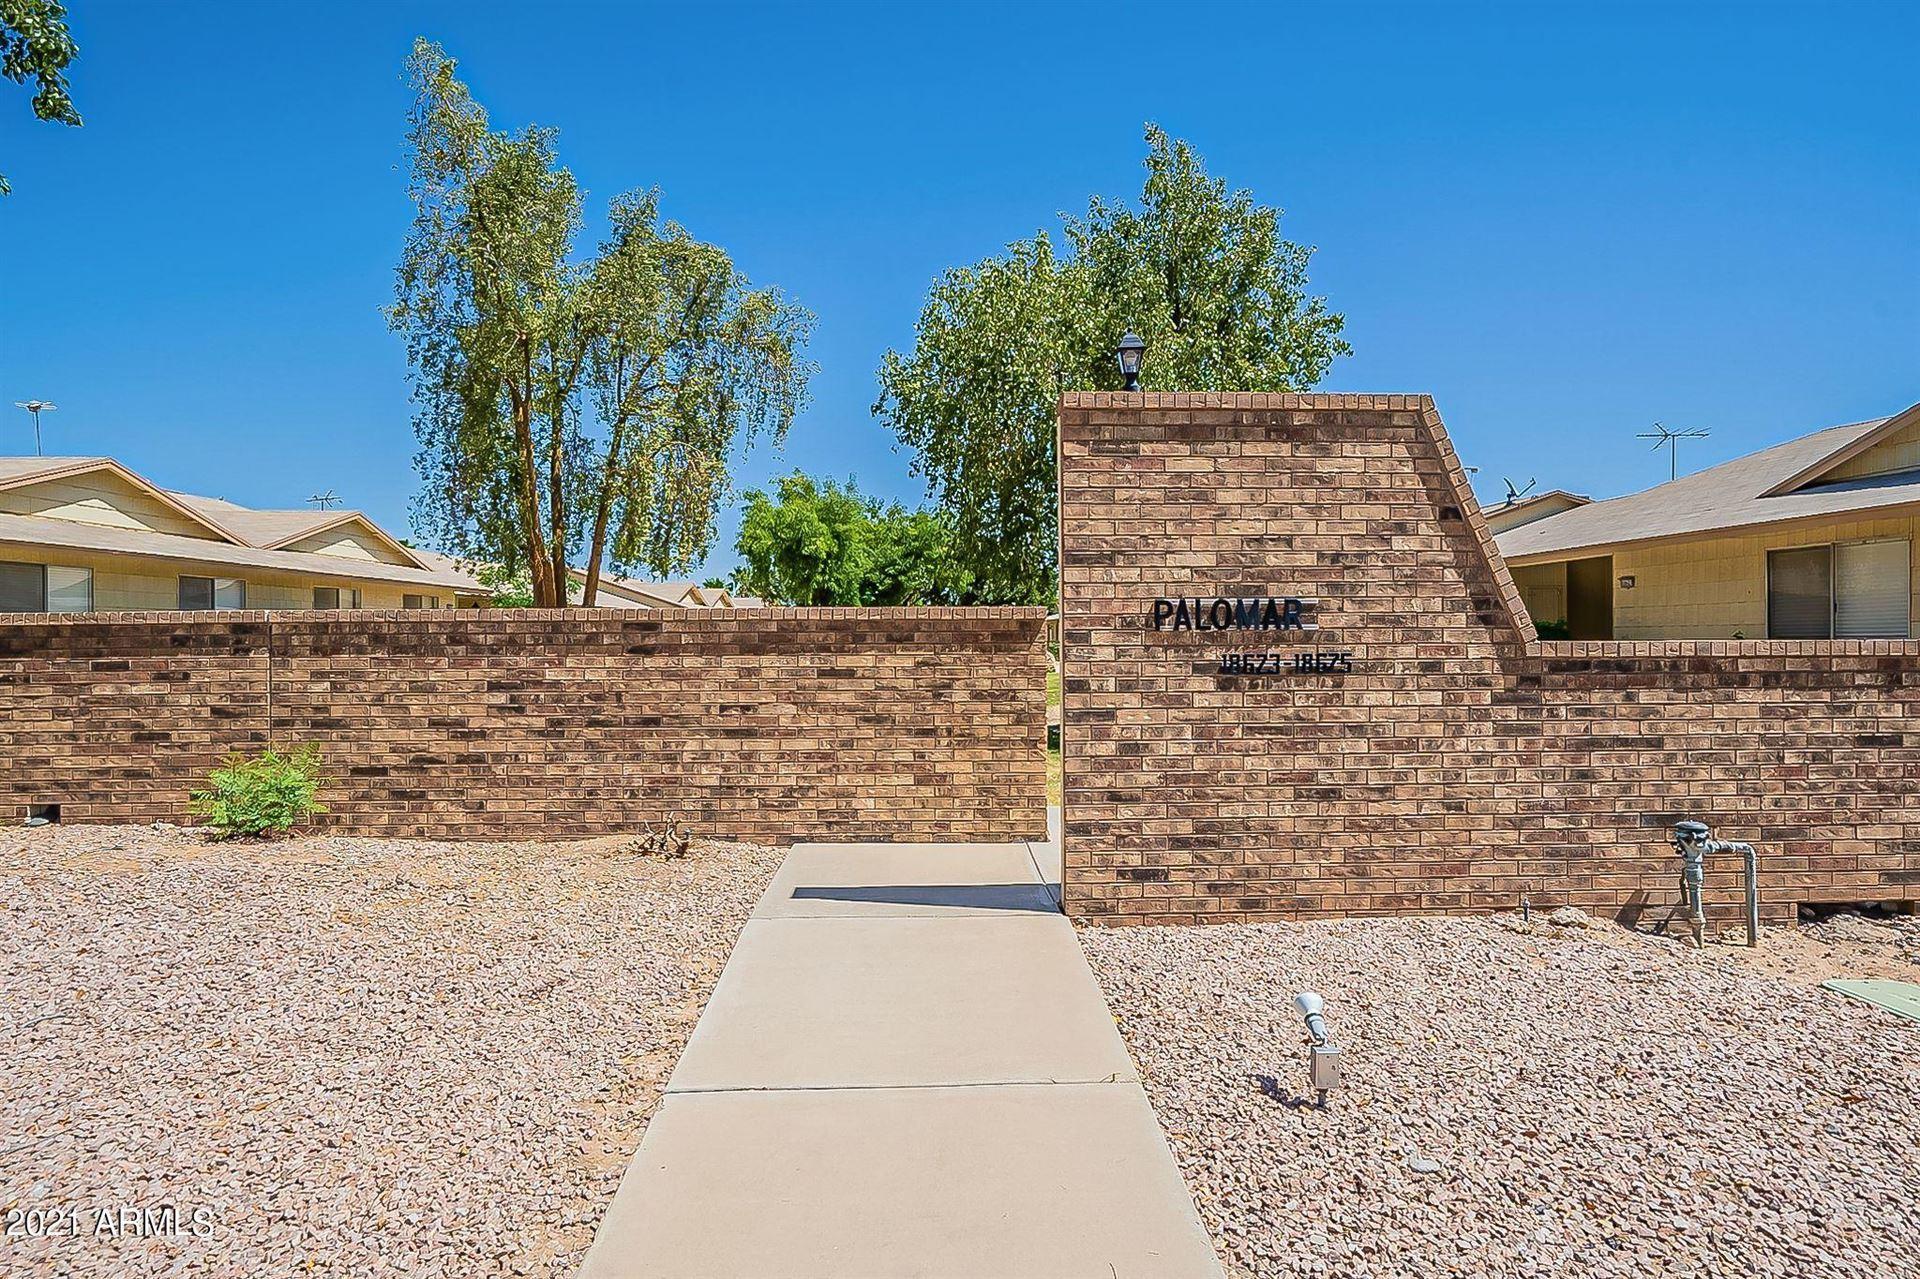 Photo of 18647 N PALOMAR Drive, Sun City West, AZ 85375 (MLS # 6221661)